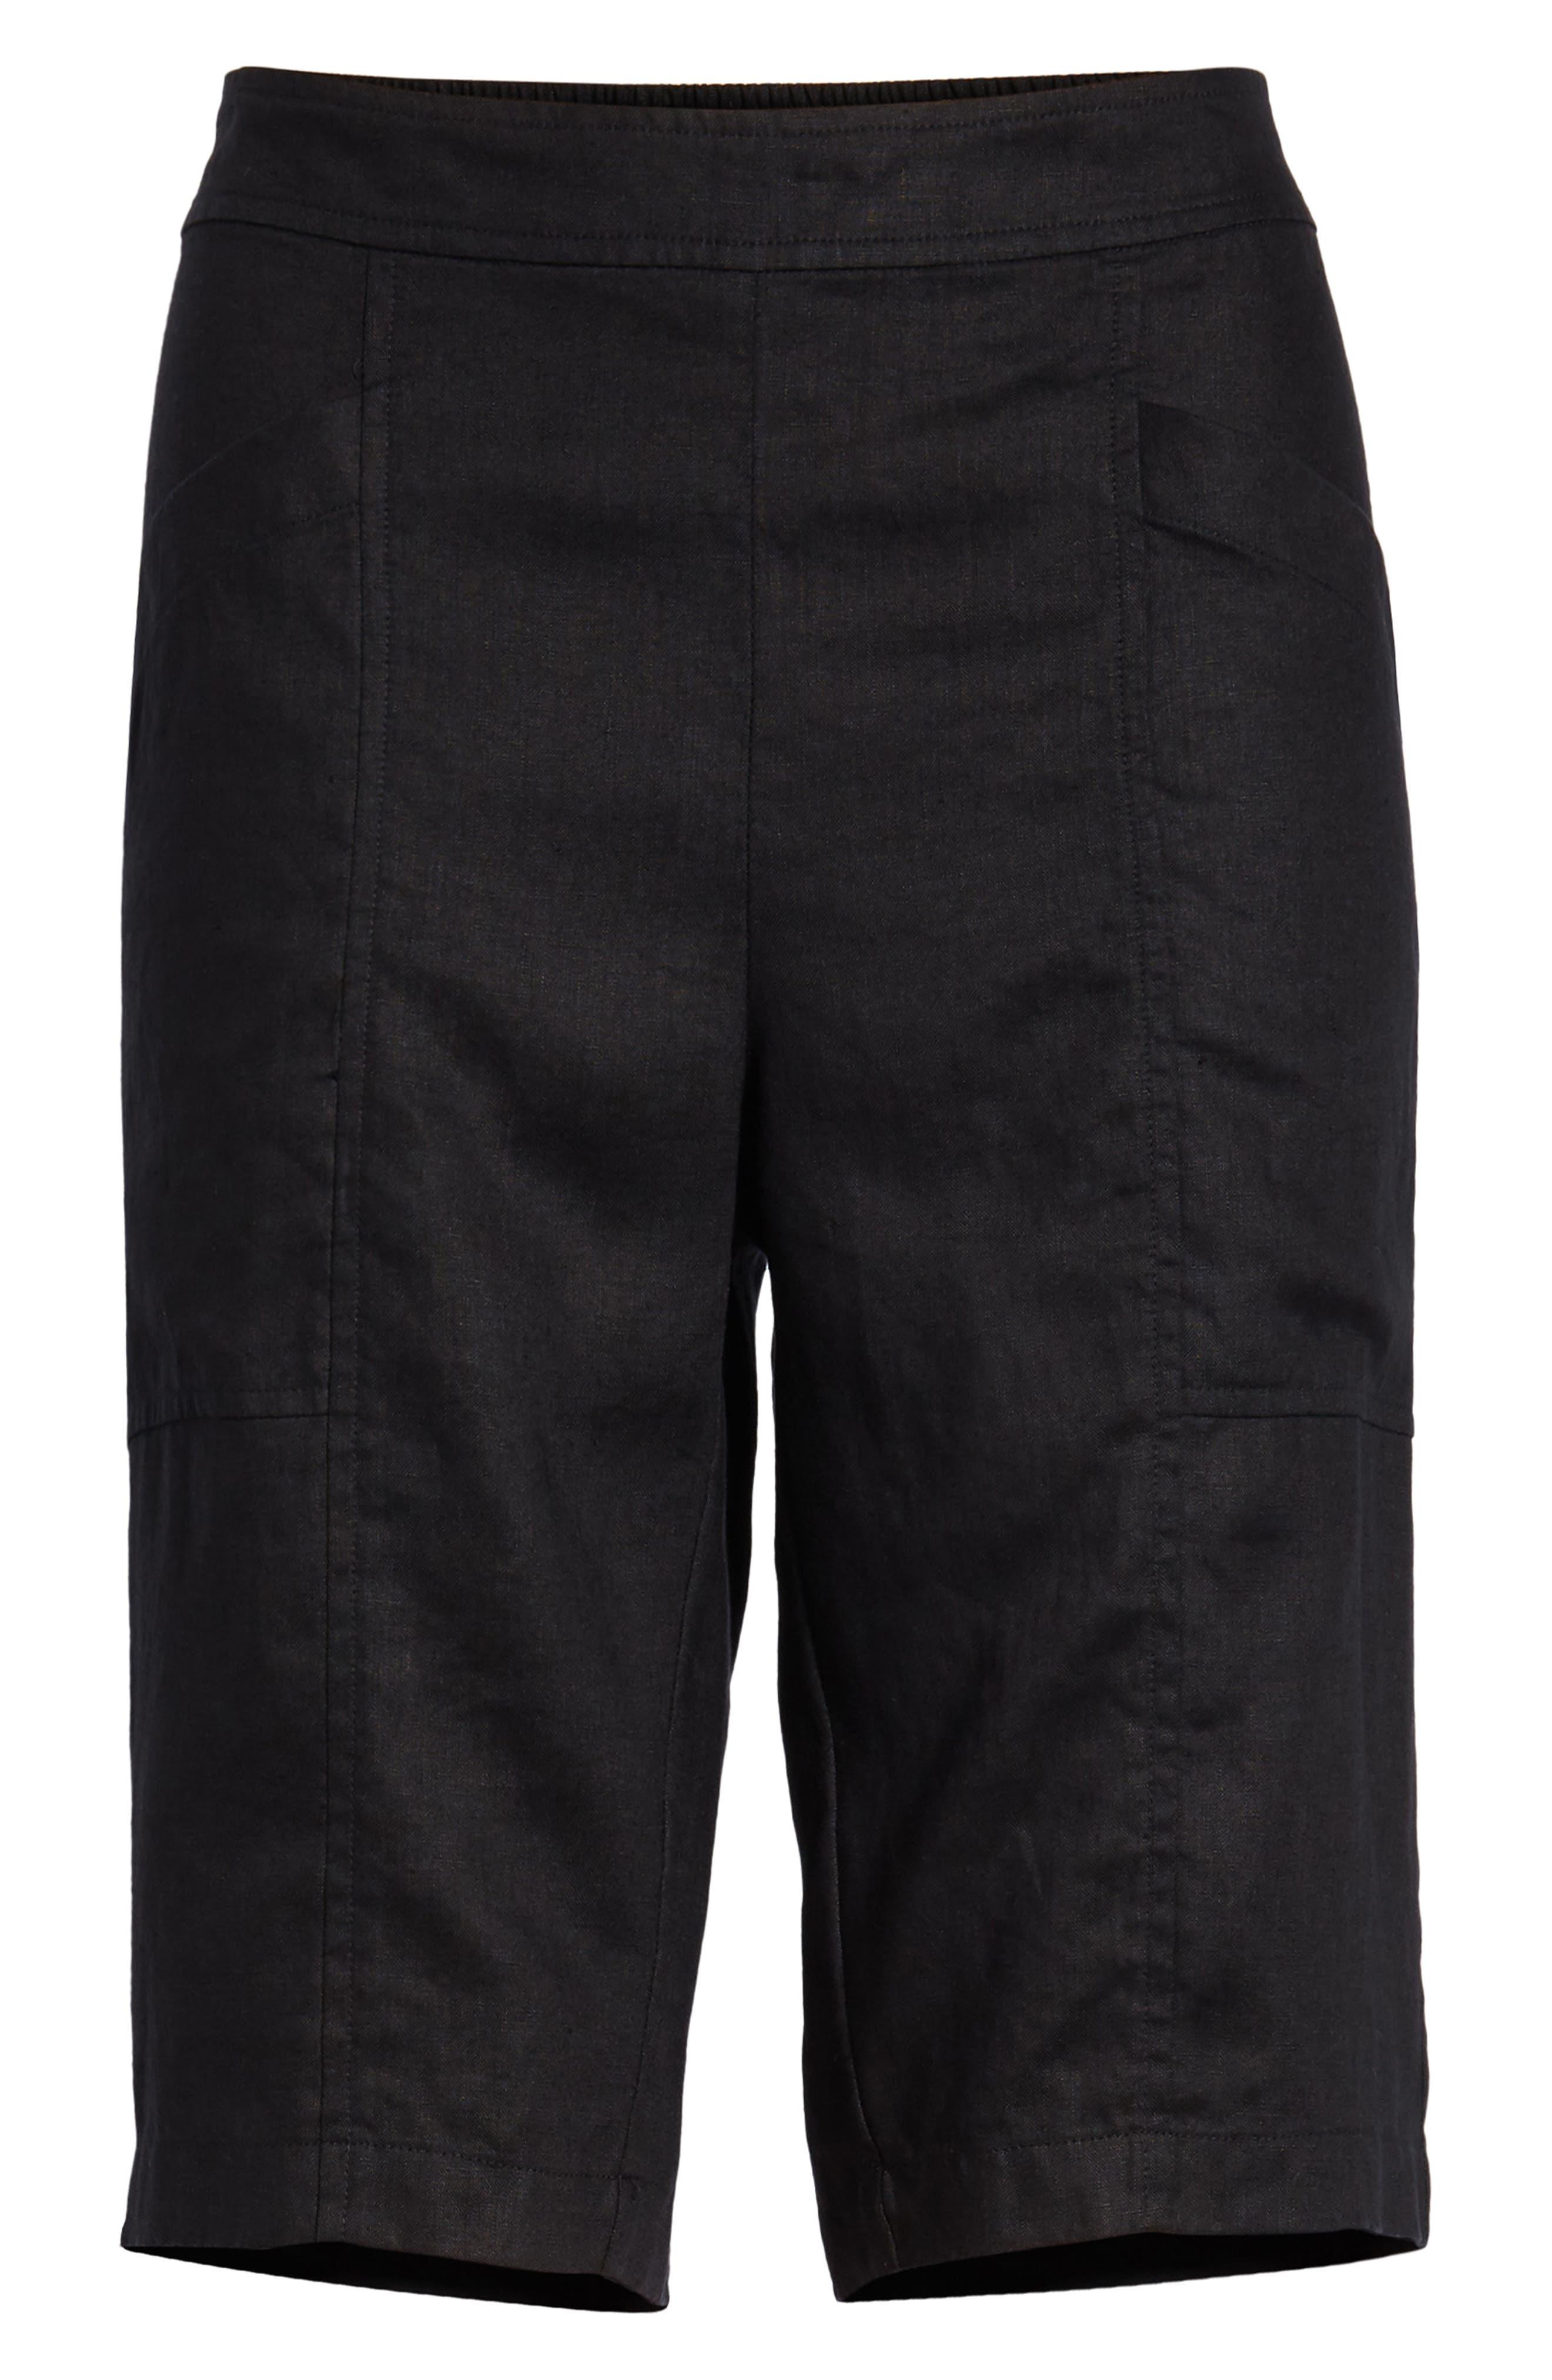 EILEEN FISHER,                             Organic Linen City Shorts,                             Alternate thumbnail 6, color,                             001